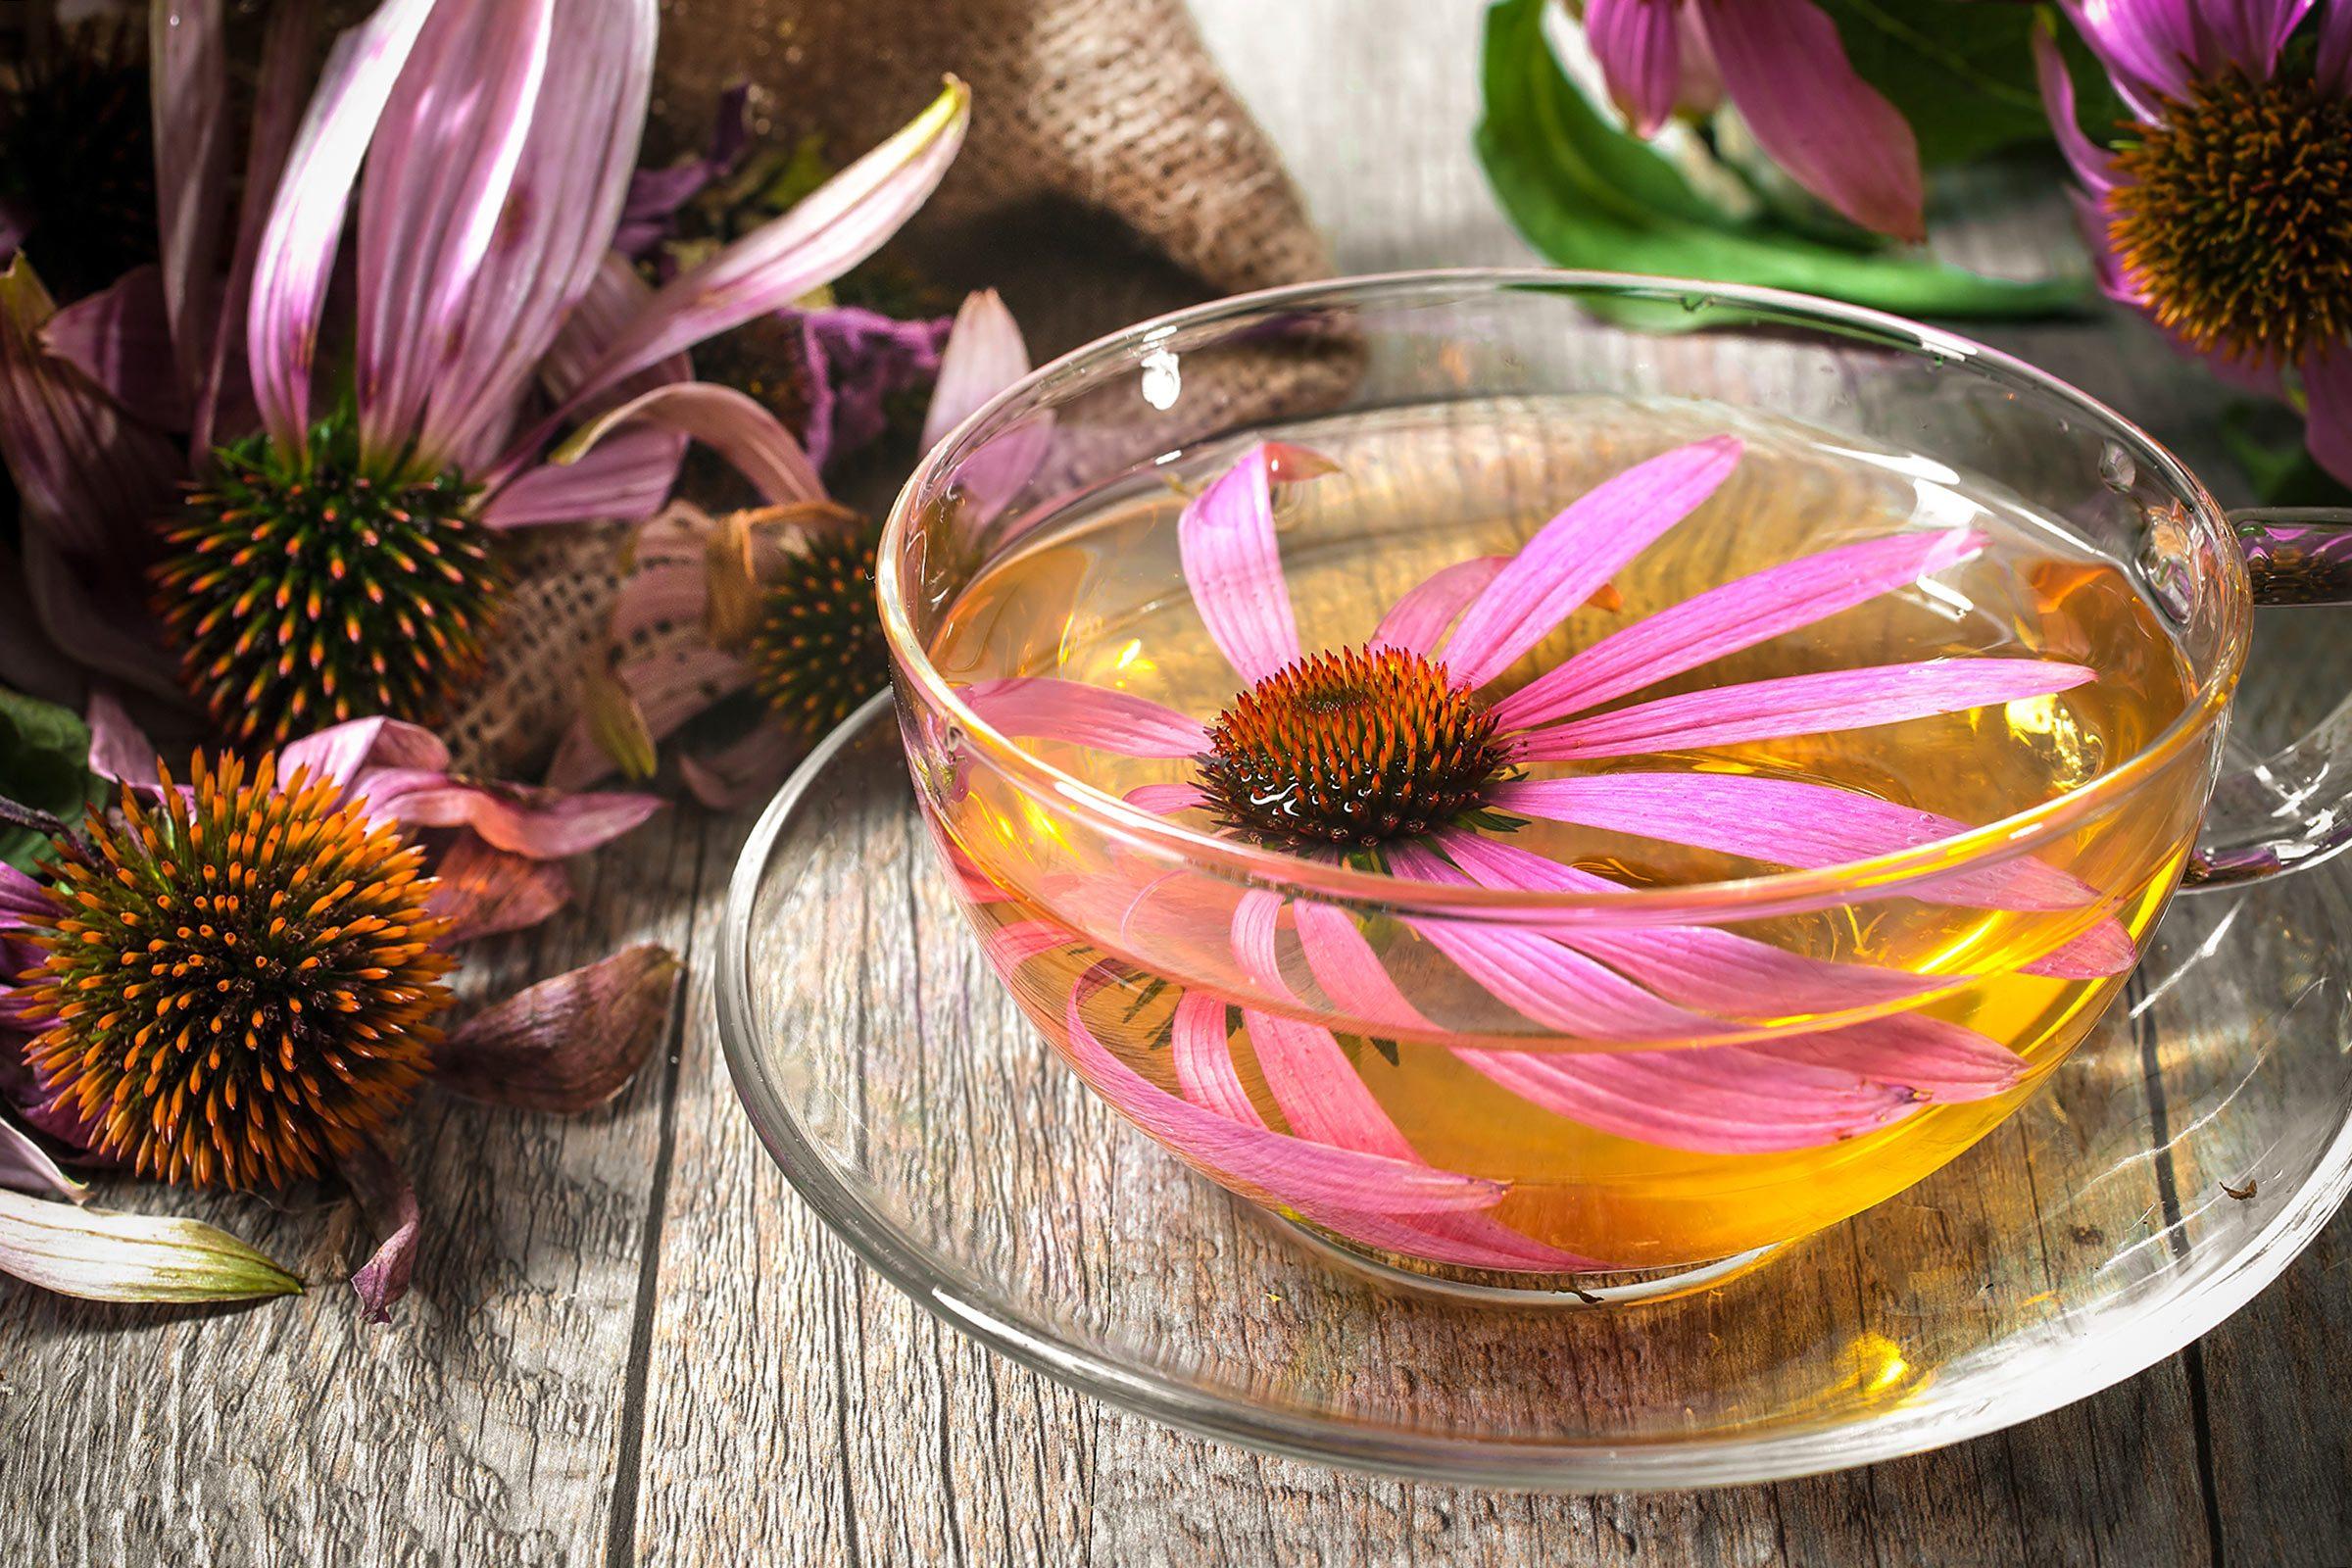 Acne home remedy: Echinacea